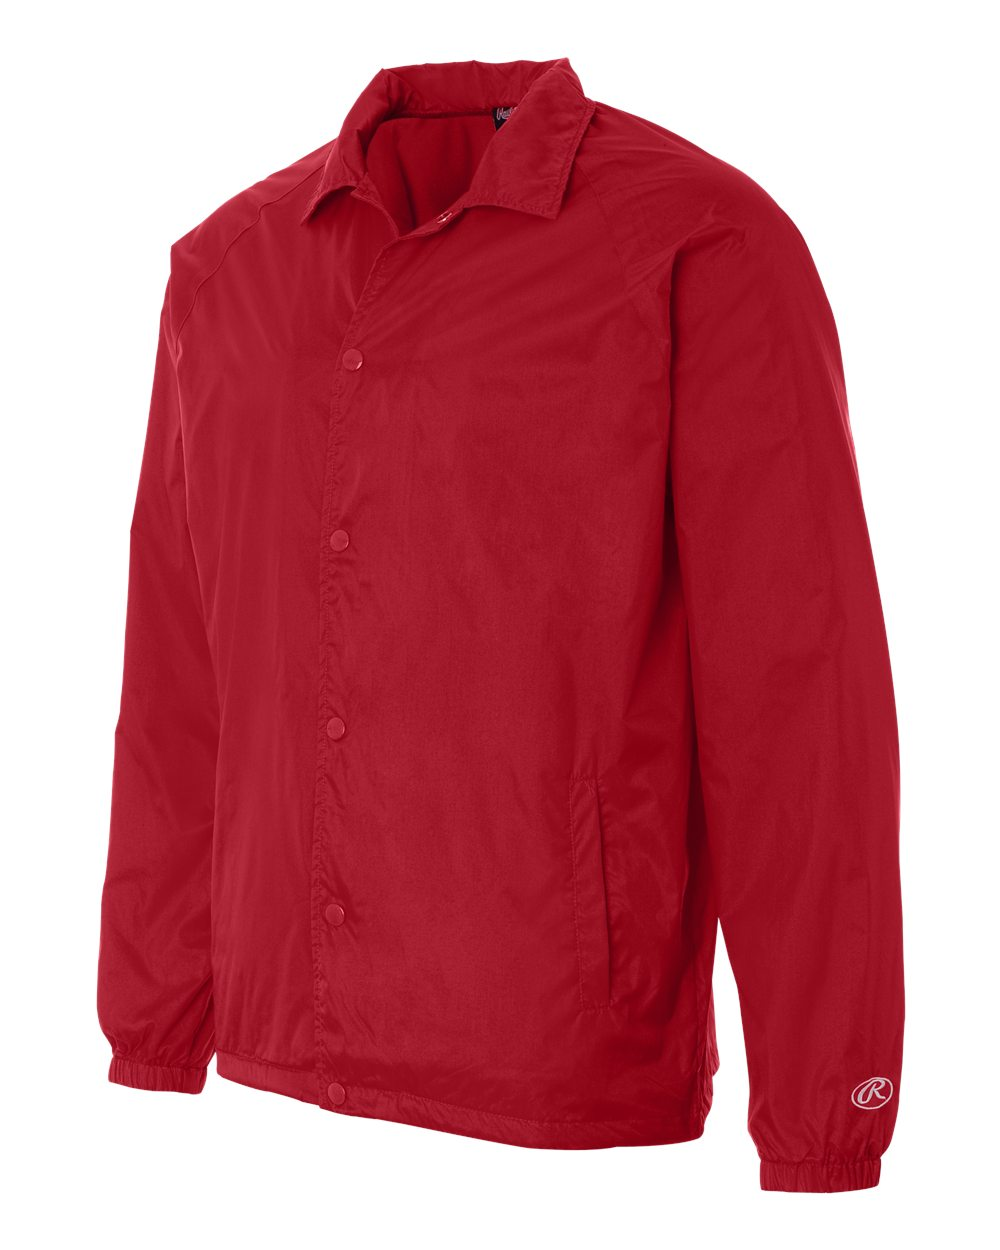 Rawlings 9718 - Nylon Coach's Jacket